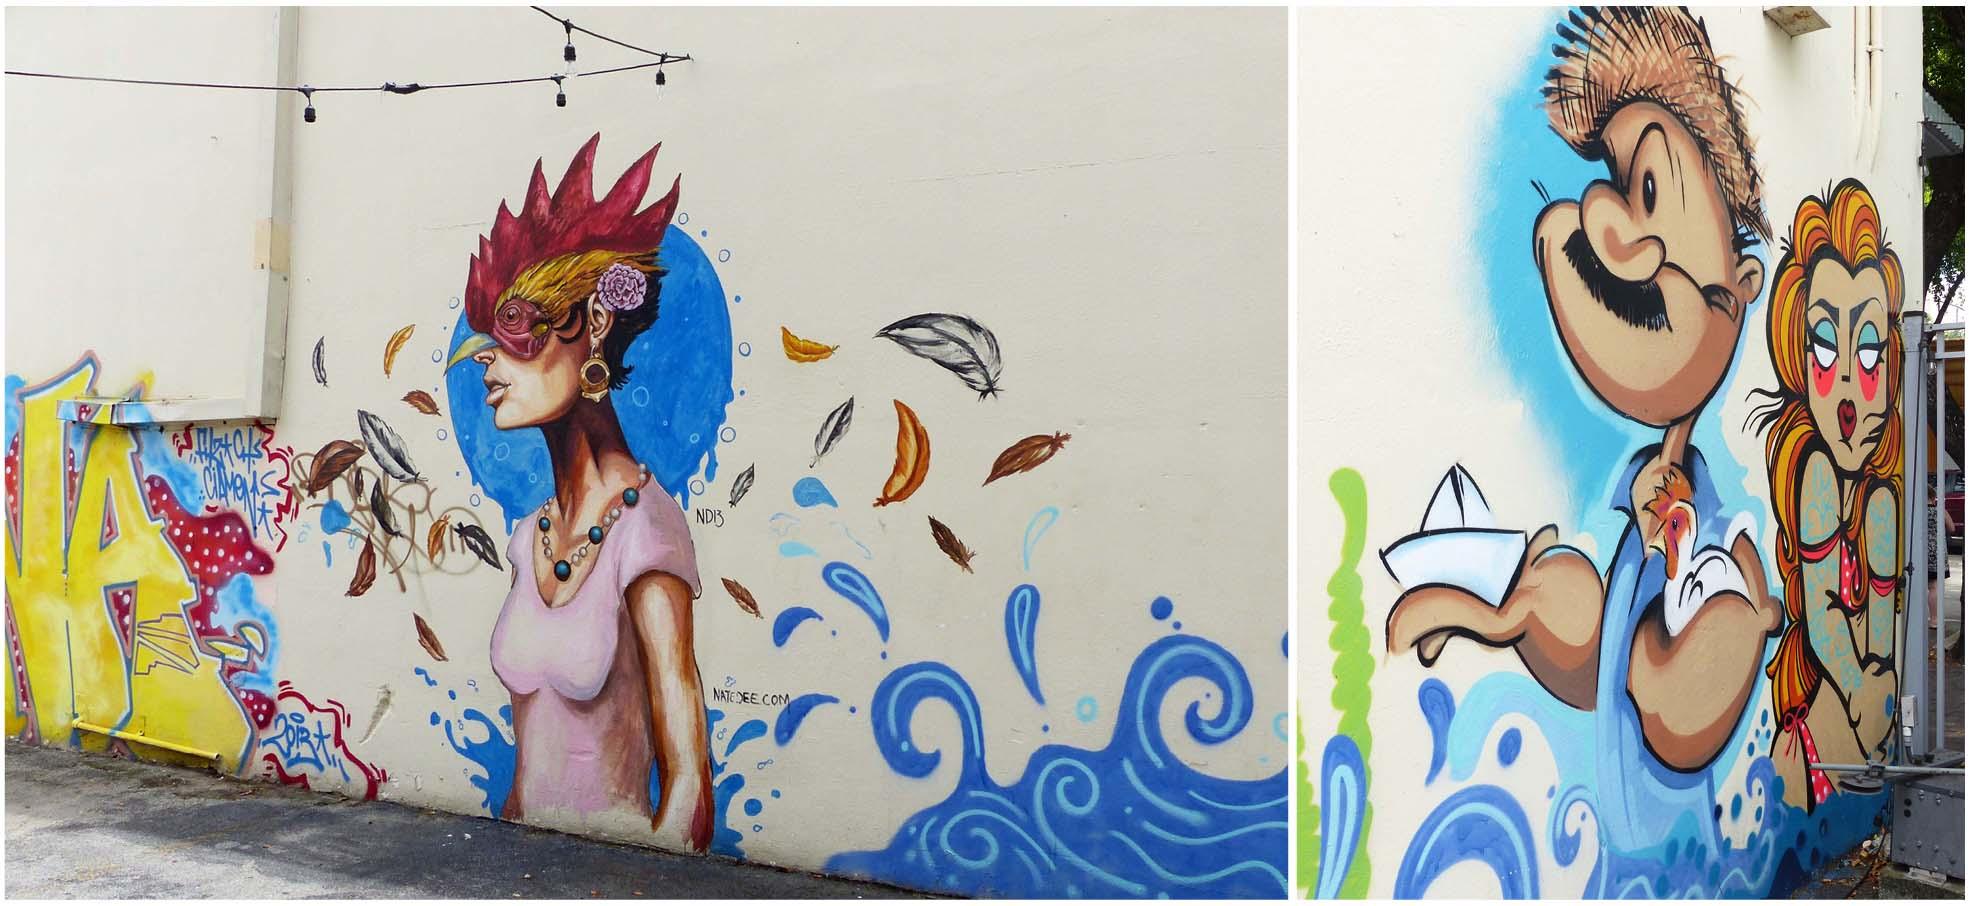 usa, art, street art, peinture, graf, road trip, voyage, street-art